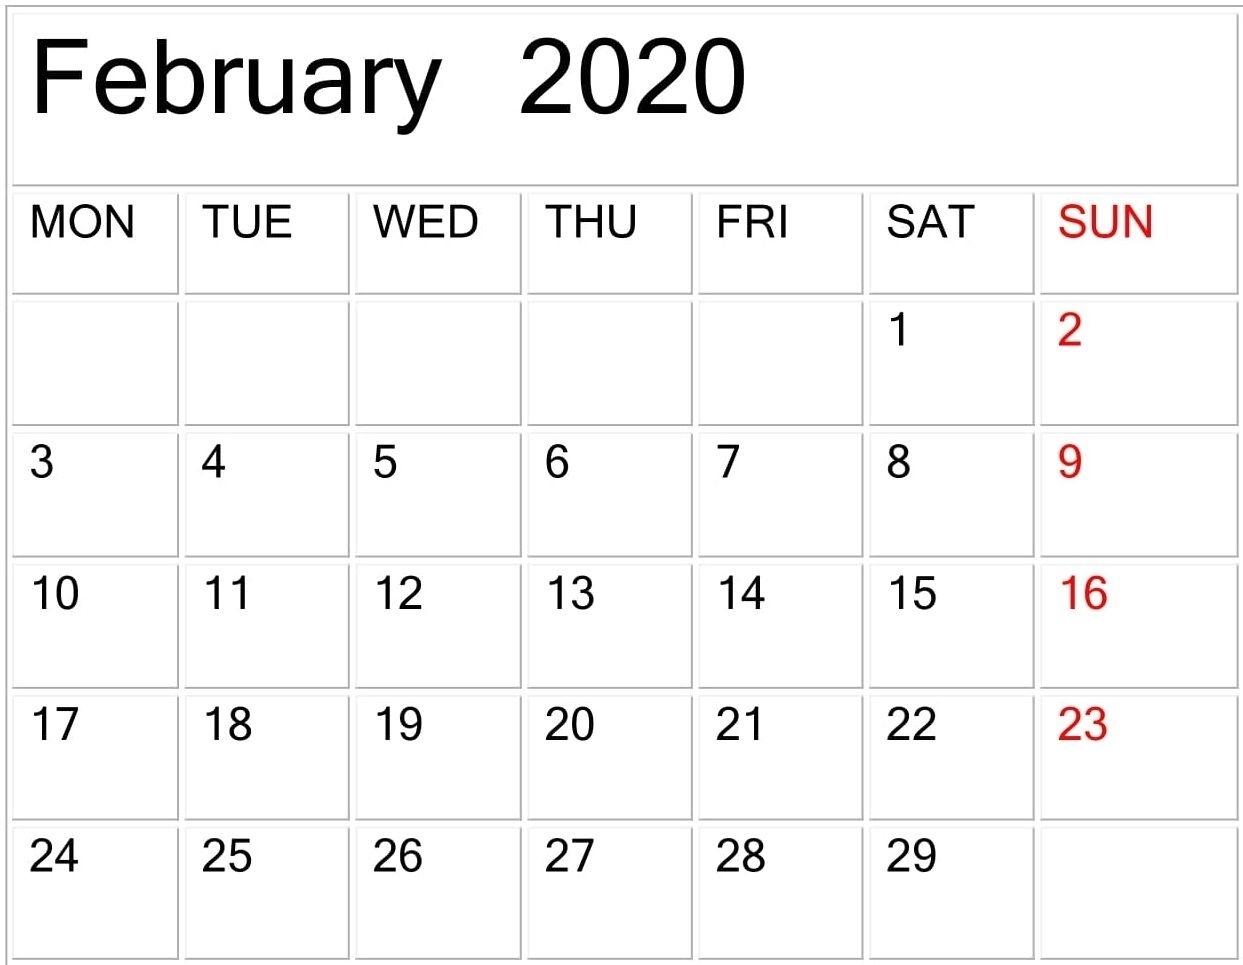 Free Printable Calendar Large Print In 2020 | Printable inside Printable Fill In 2020 Calendar Large Print